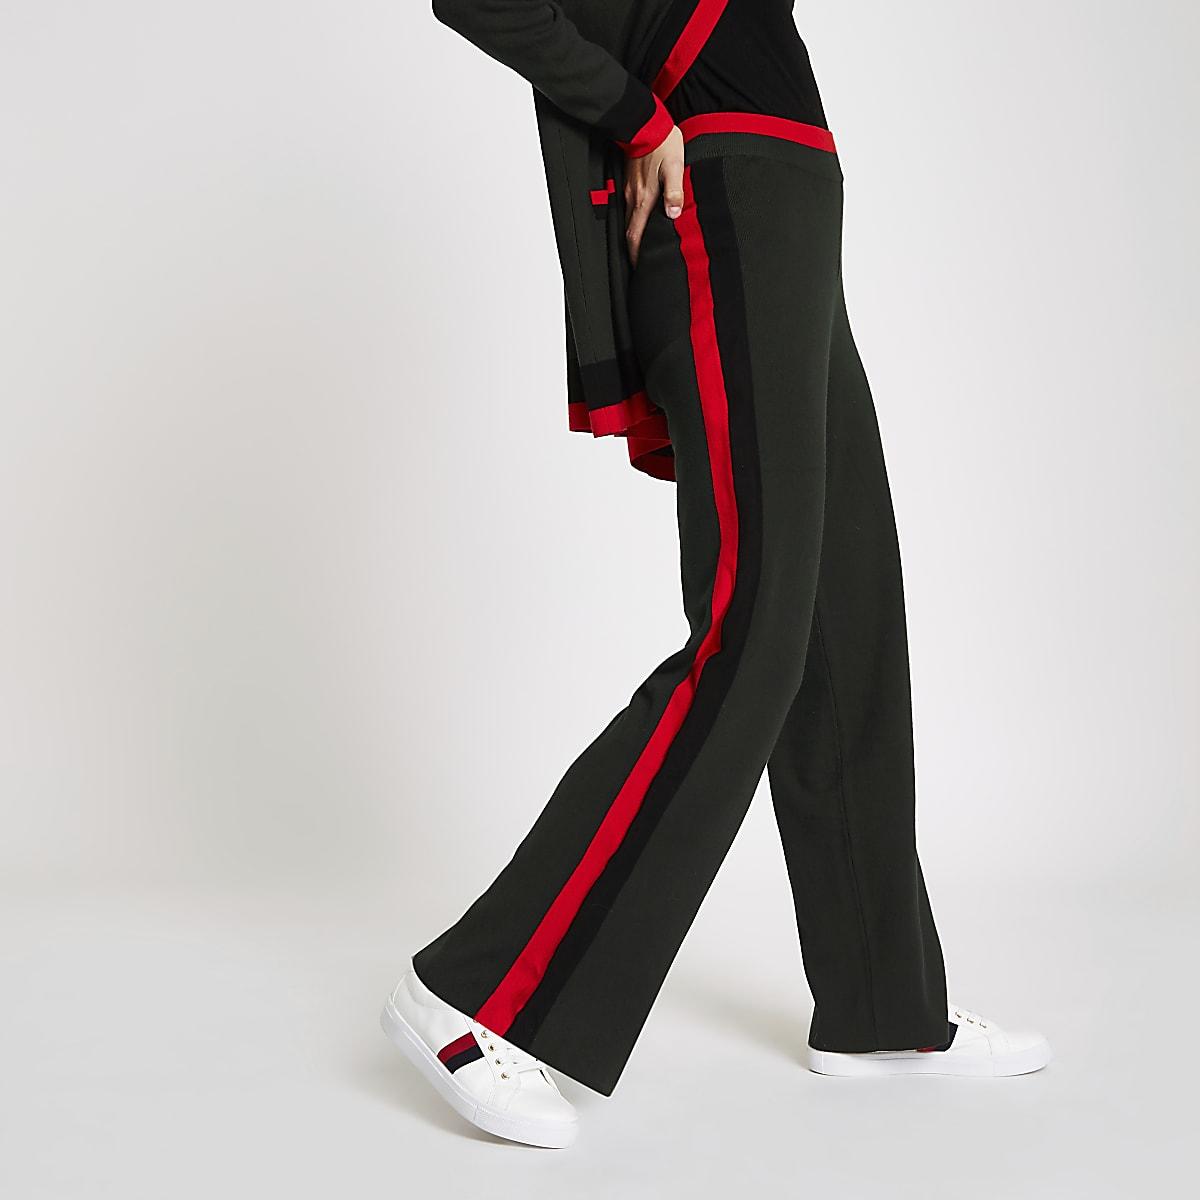 Khaki knitted side stripe trousers